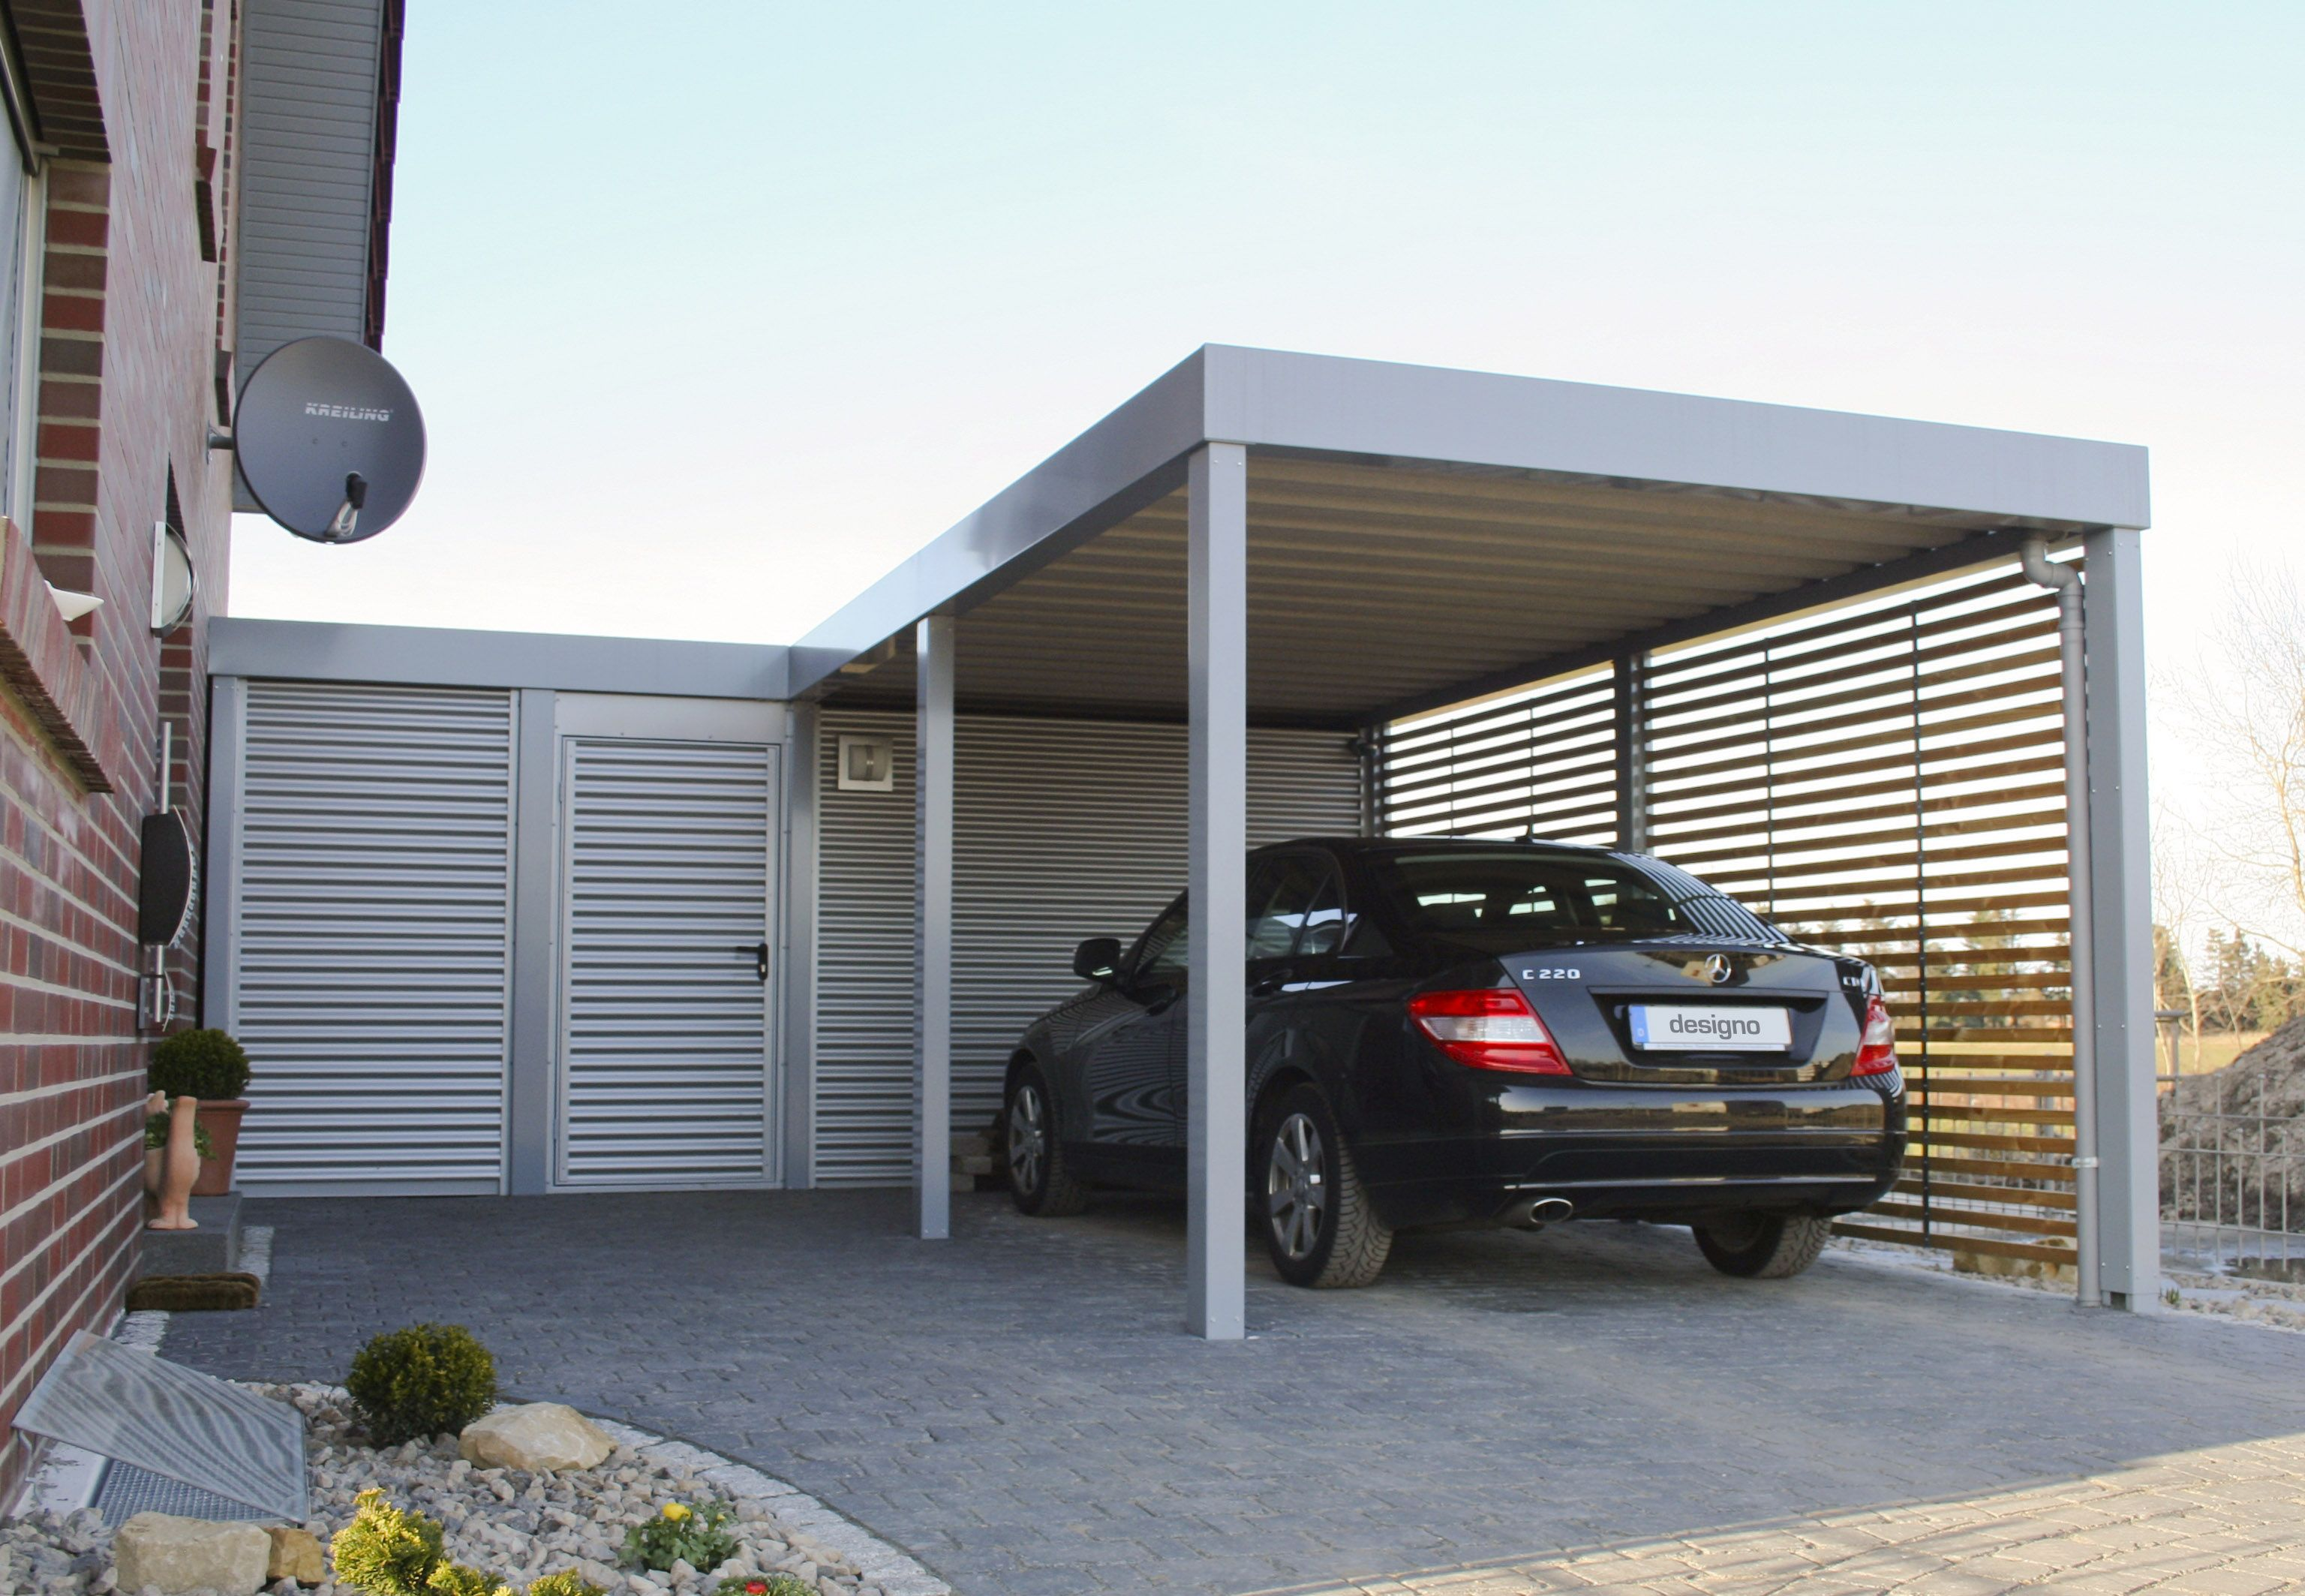 vier tipps zum carport bauen carport dornum pinterest carport bauen selbst. Black Bedroom Furniture Sets. Home Design Ideas